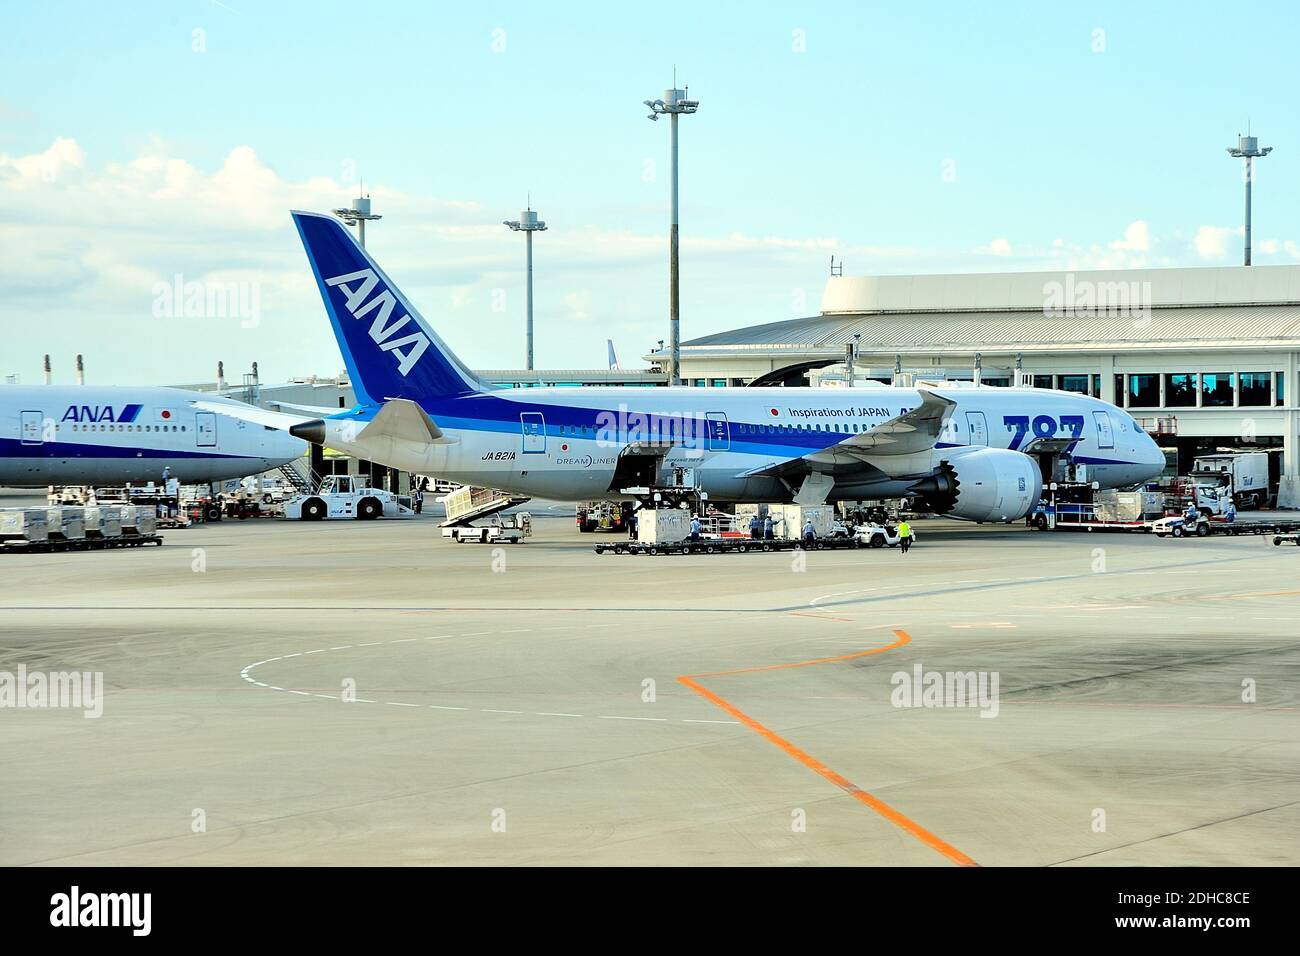 All Nippon Airways, ANA, Boeing, B-787-8, JA821A, At Gate, Naha Airport, Naha, Okinawa, Ryukyu Islands, Japan Stock Photo